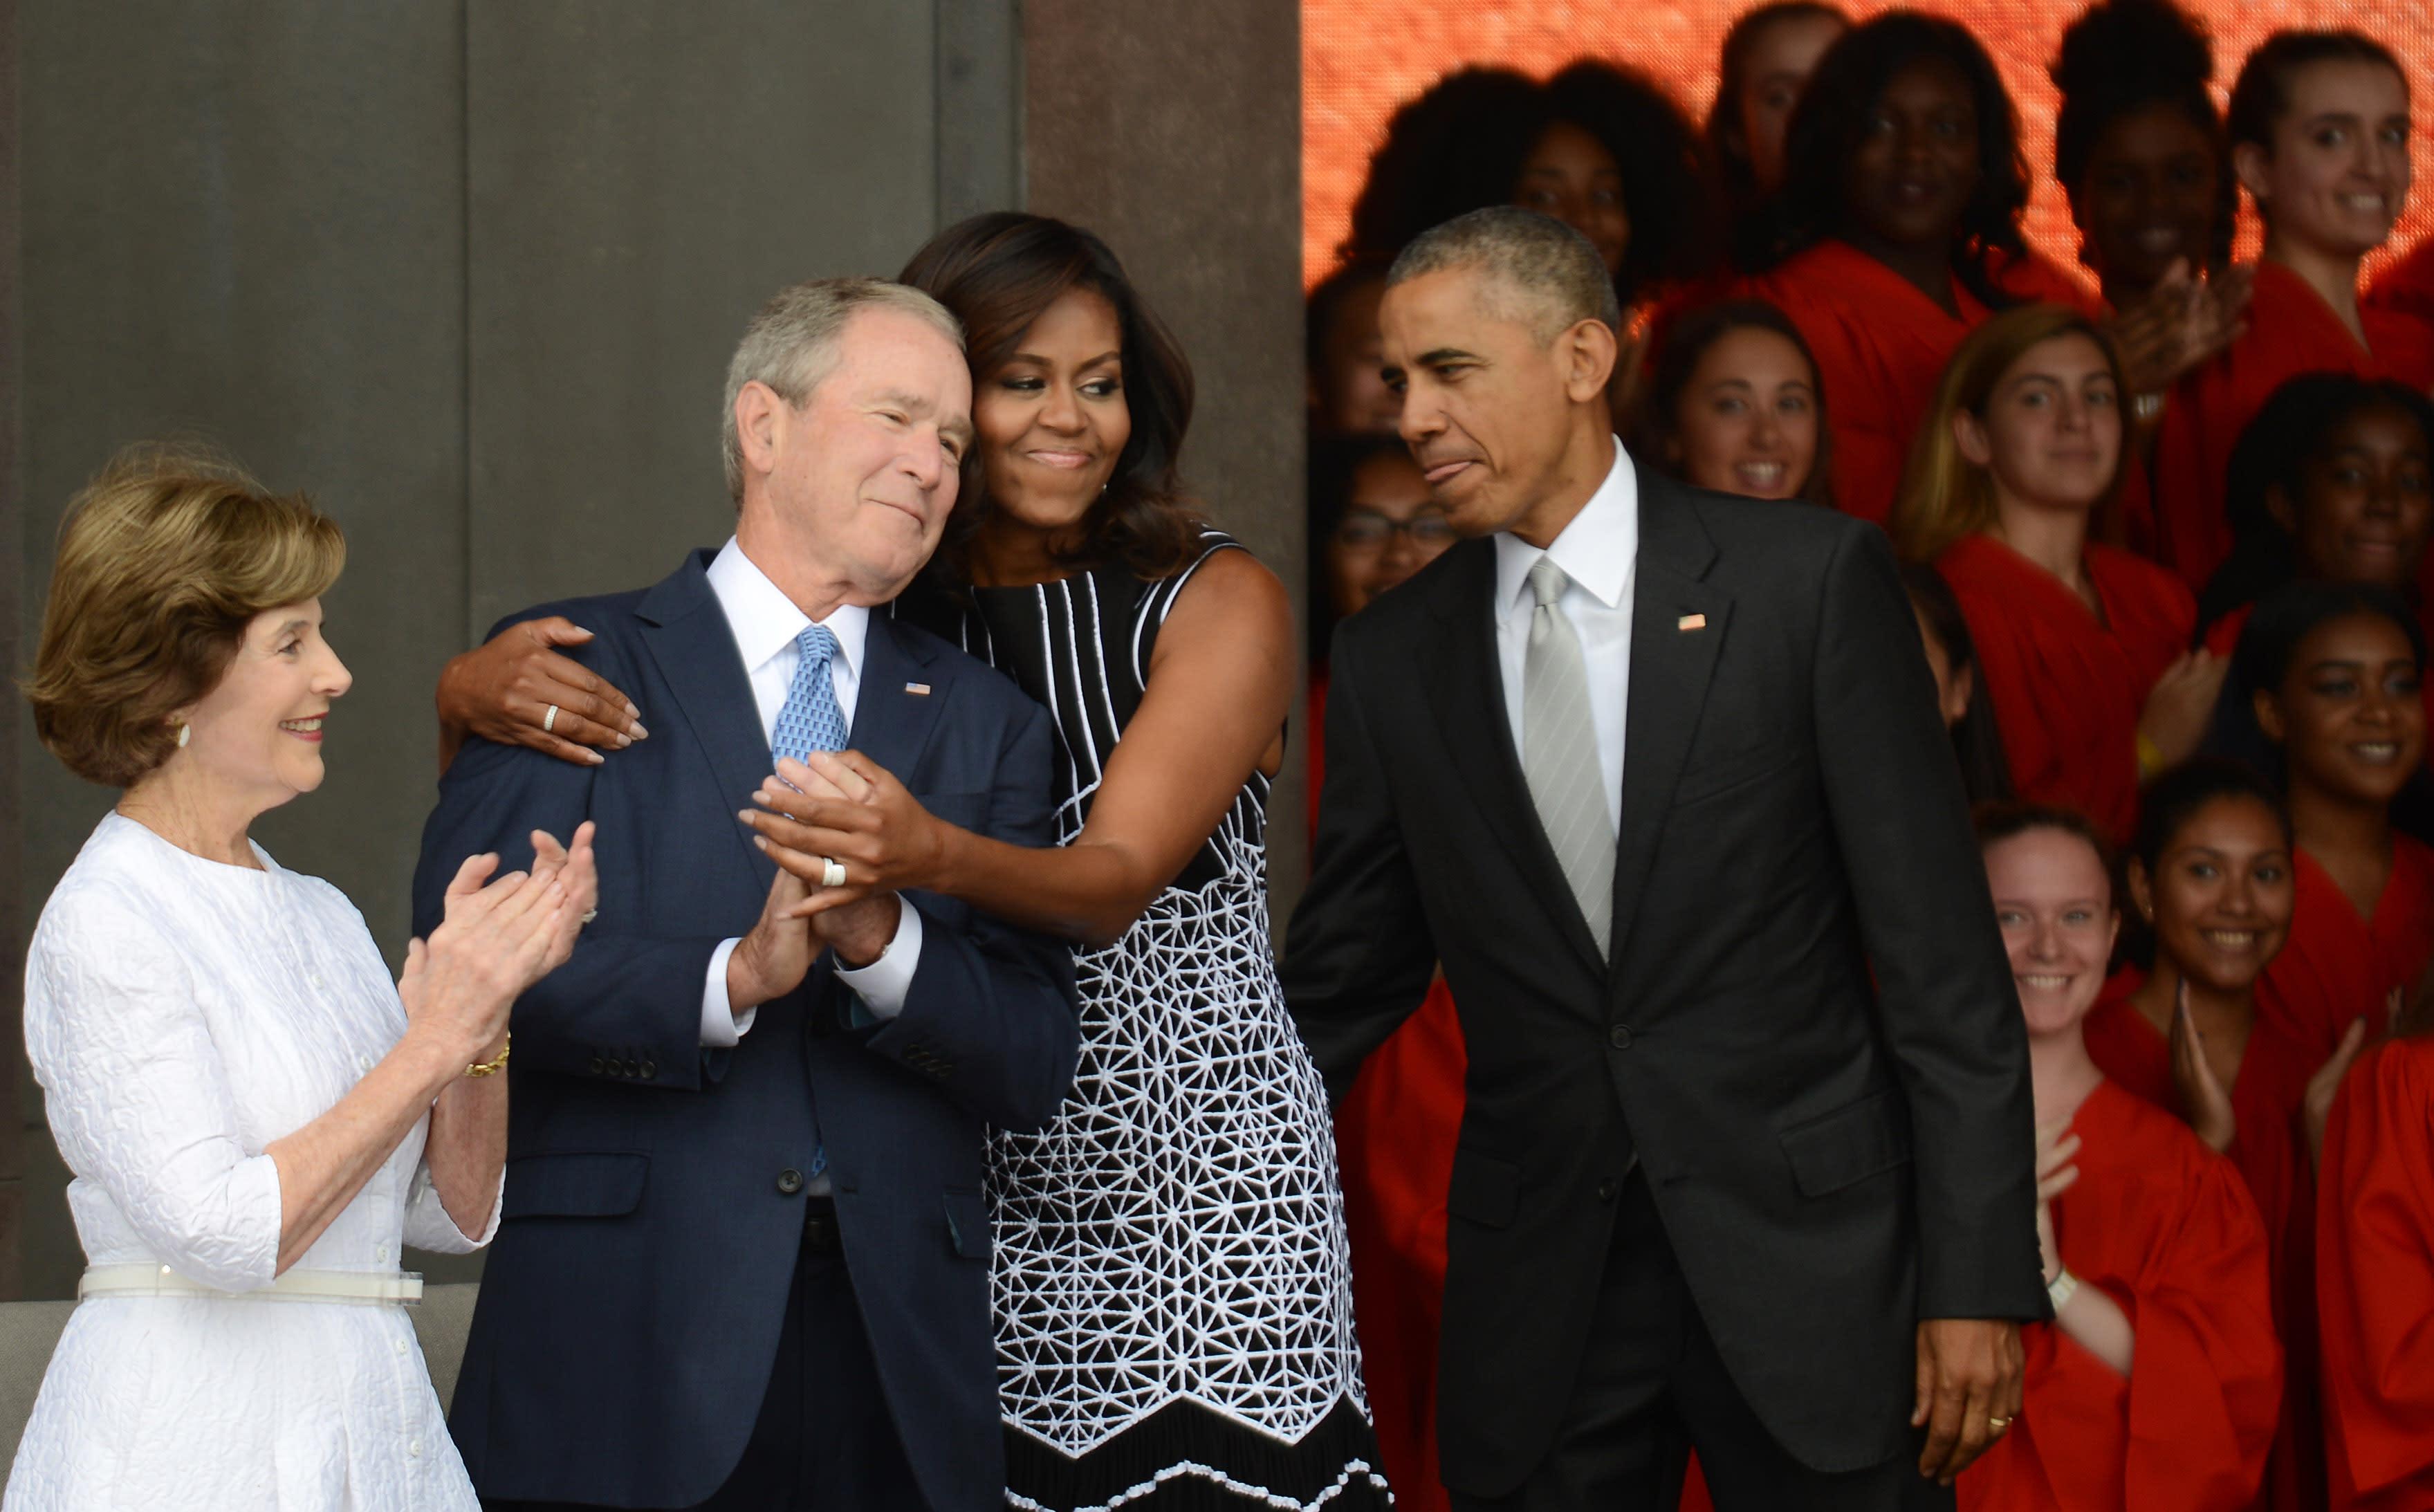 Michelle Obama Gushes About Wonderful Man George W Bush